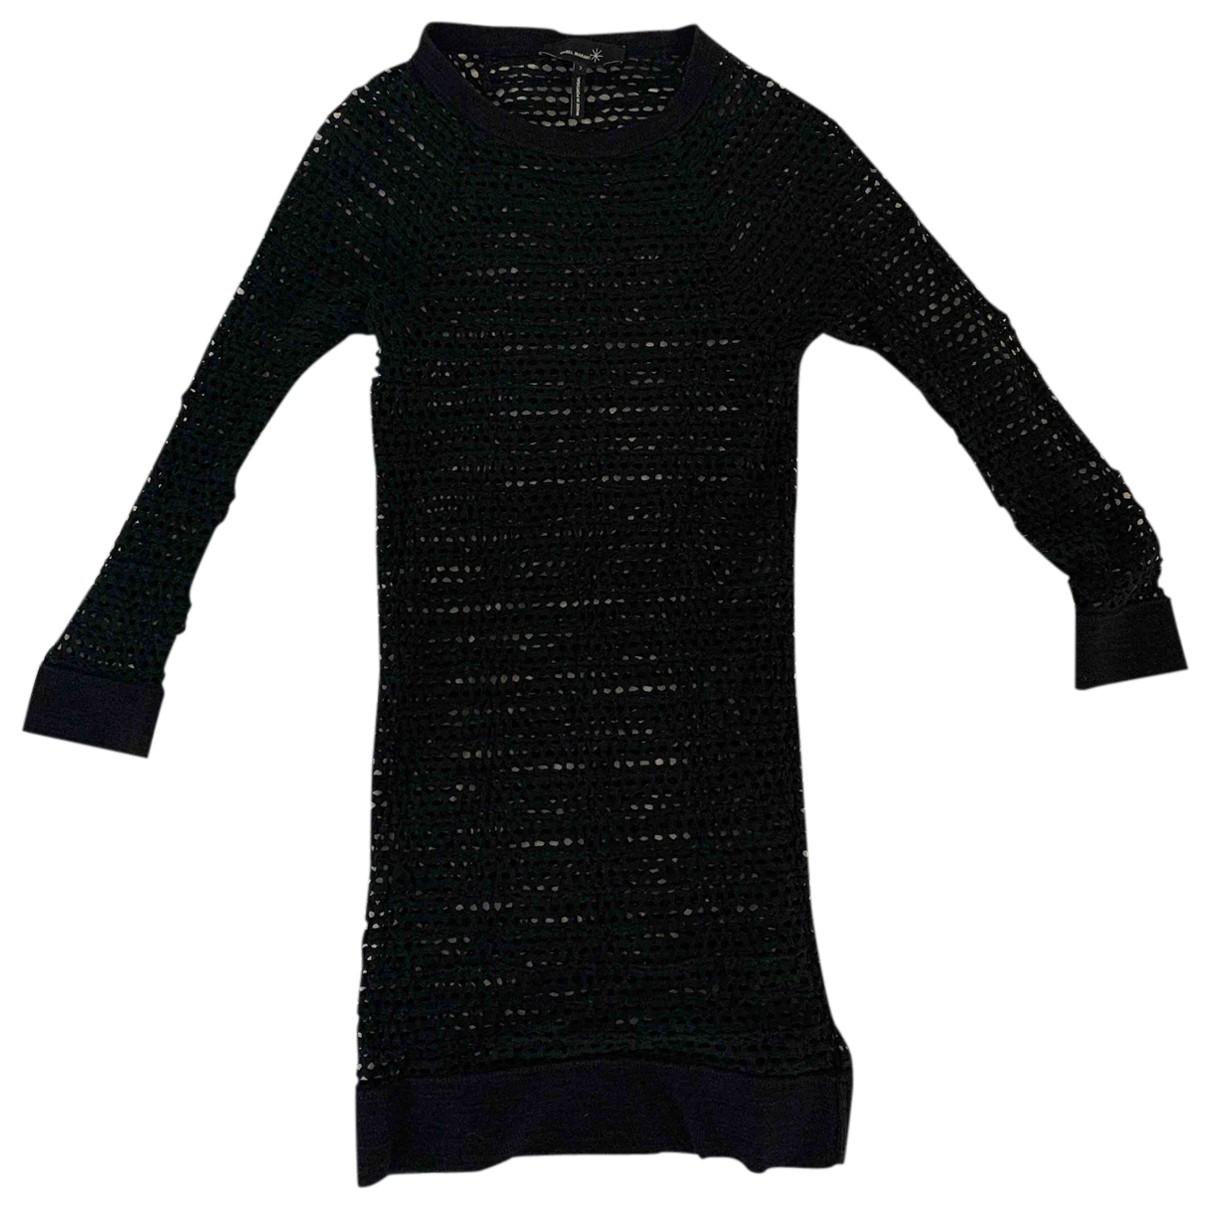 Isabel Marant \N Black Cotton - elasthane dress for Women 2 0-5